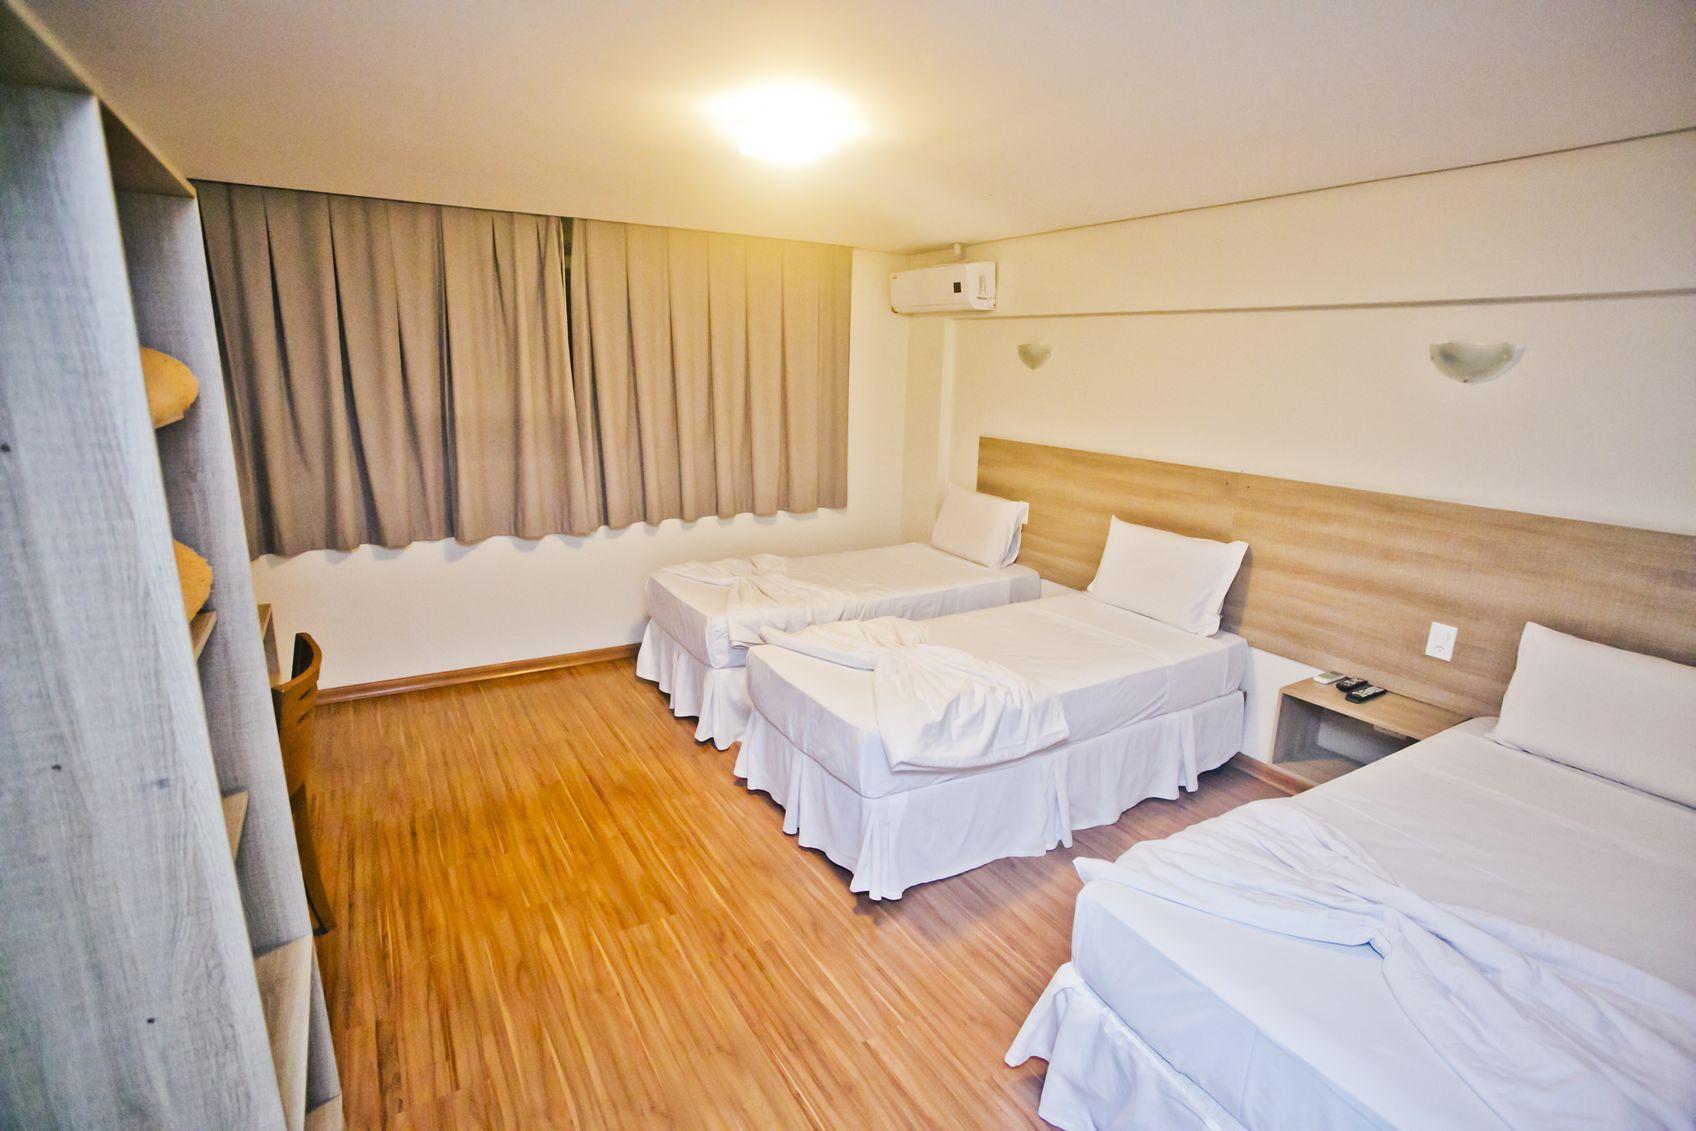 Dallé Hotel - Luxo Solteiro